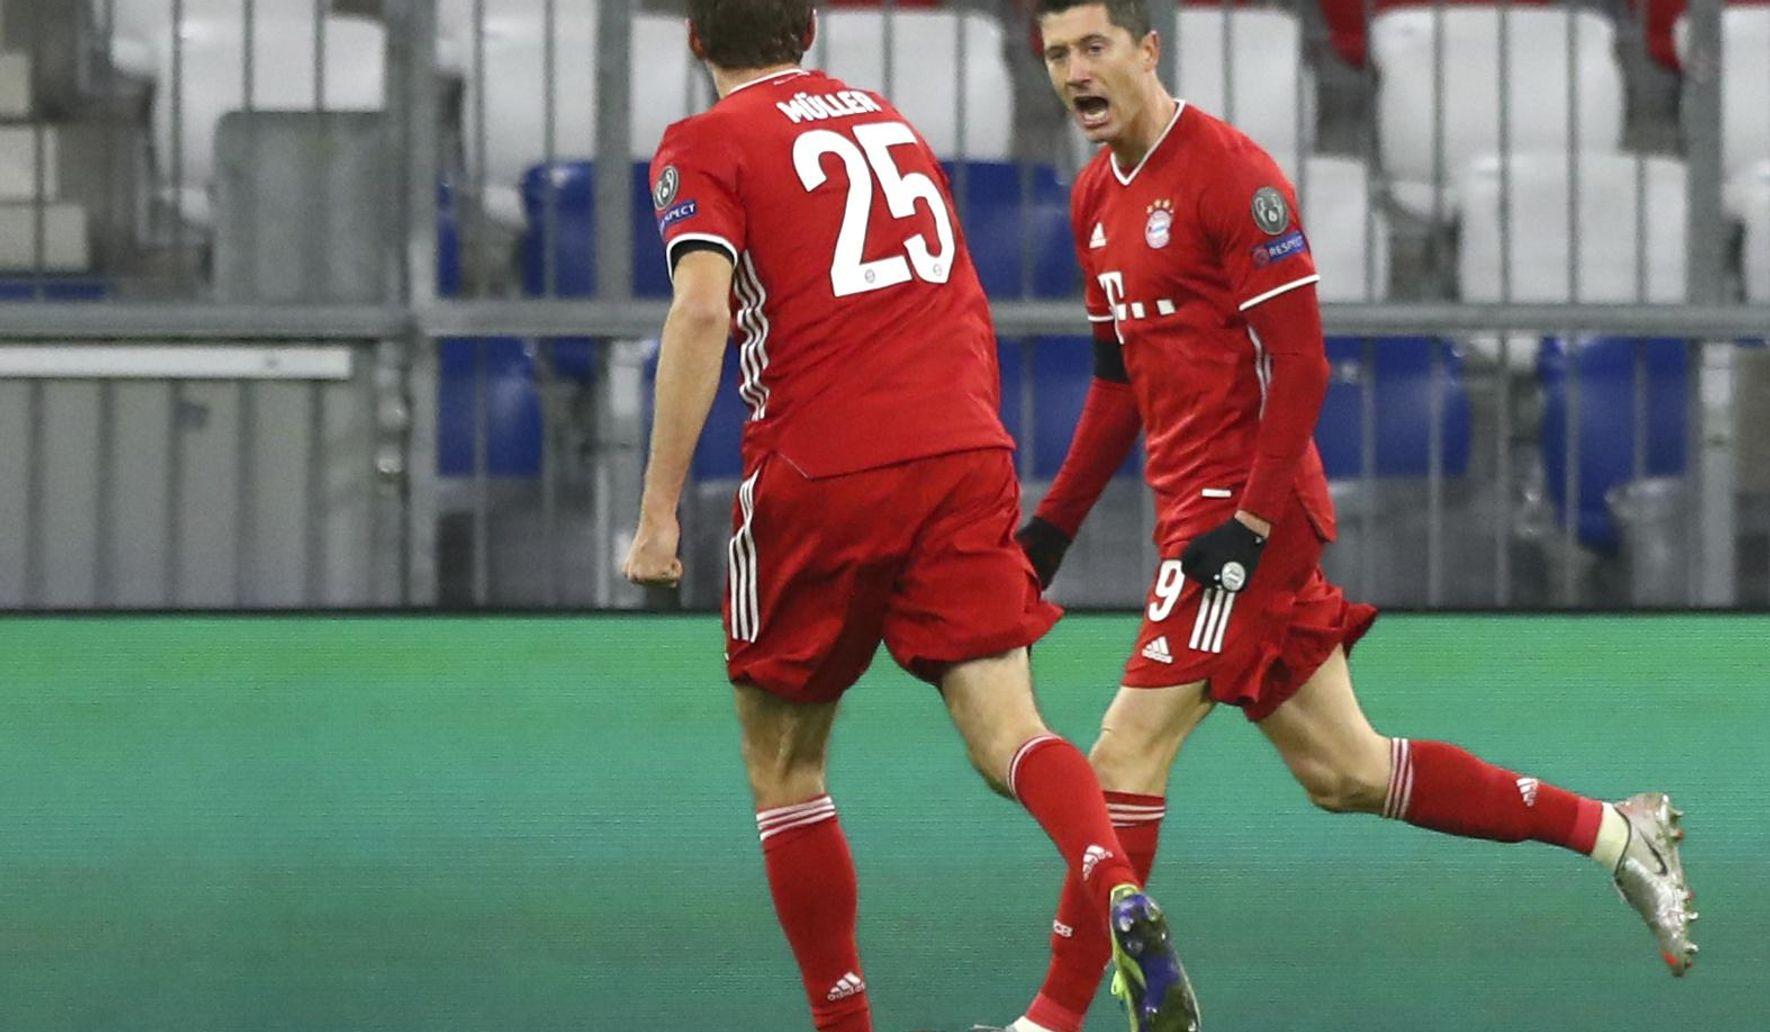 Germany_soccer_champions_league_32645_c0-108-1575-1026_s1770x1032